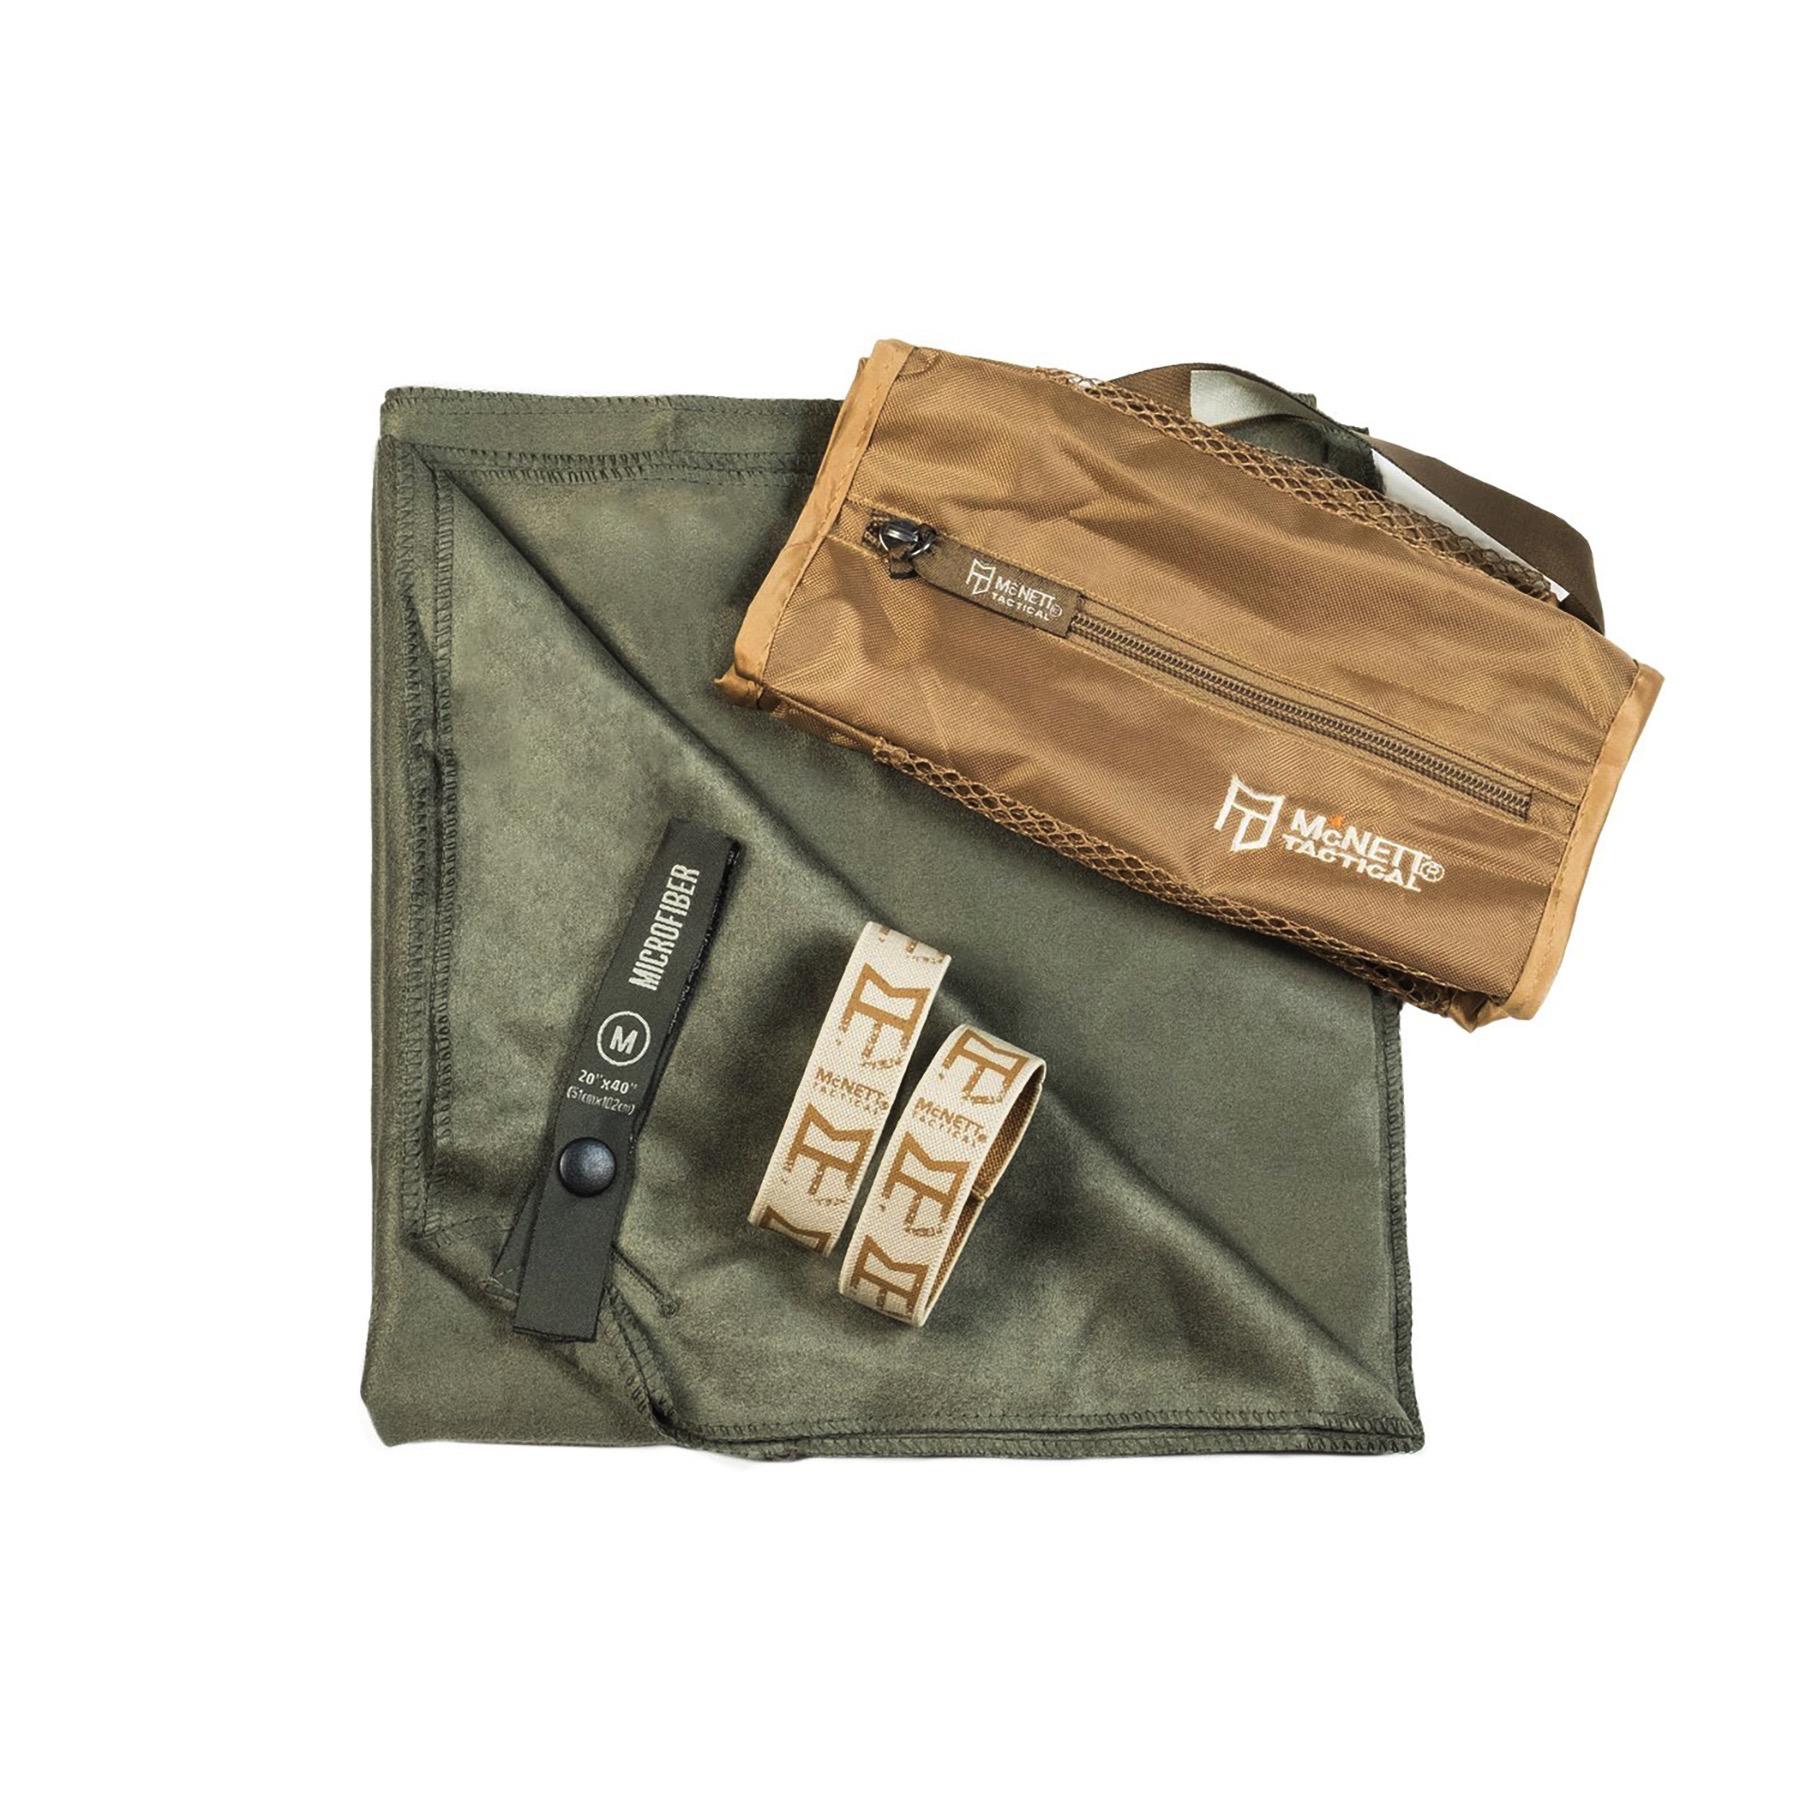 Gear Aid McNett Tactical Ultra Compact Microfiber Towel /& Bag Green Medium Camp